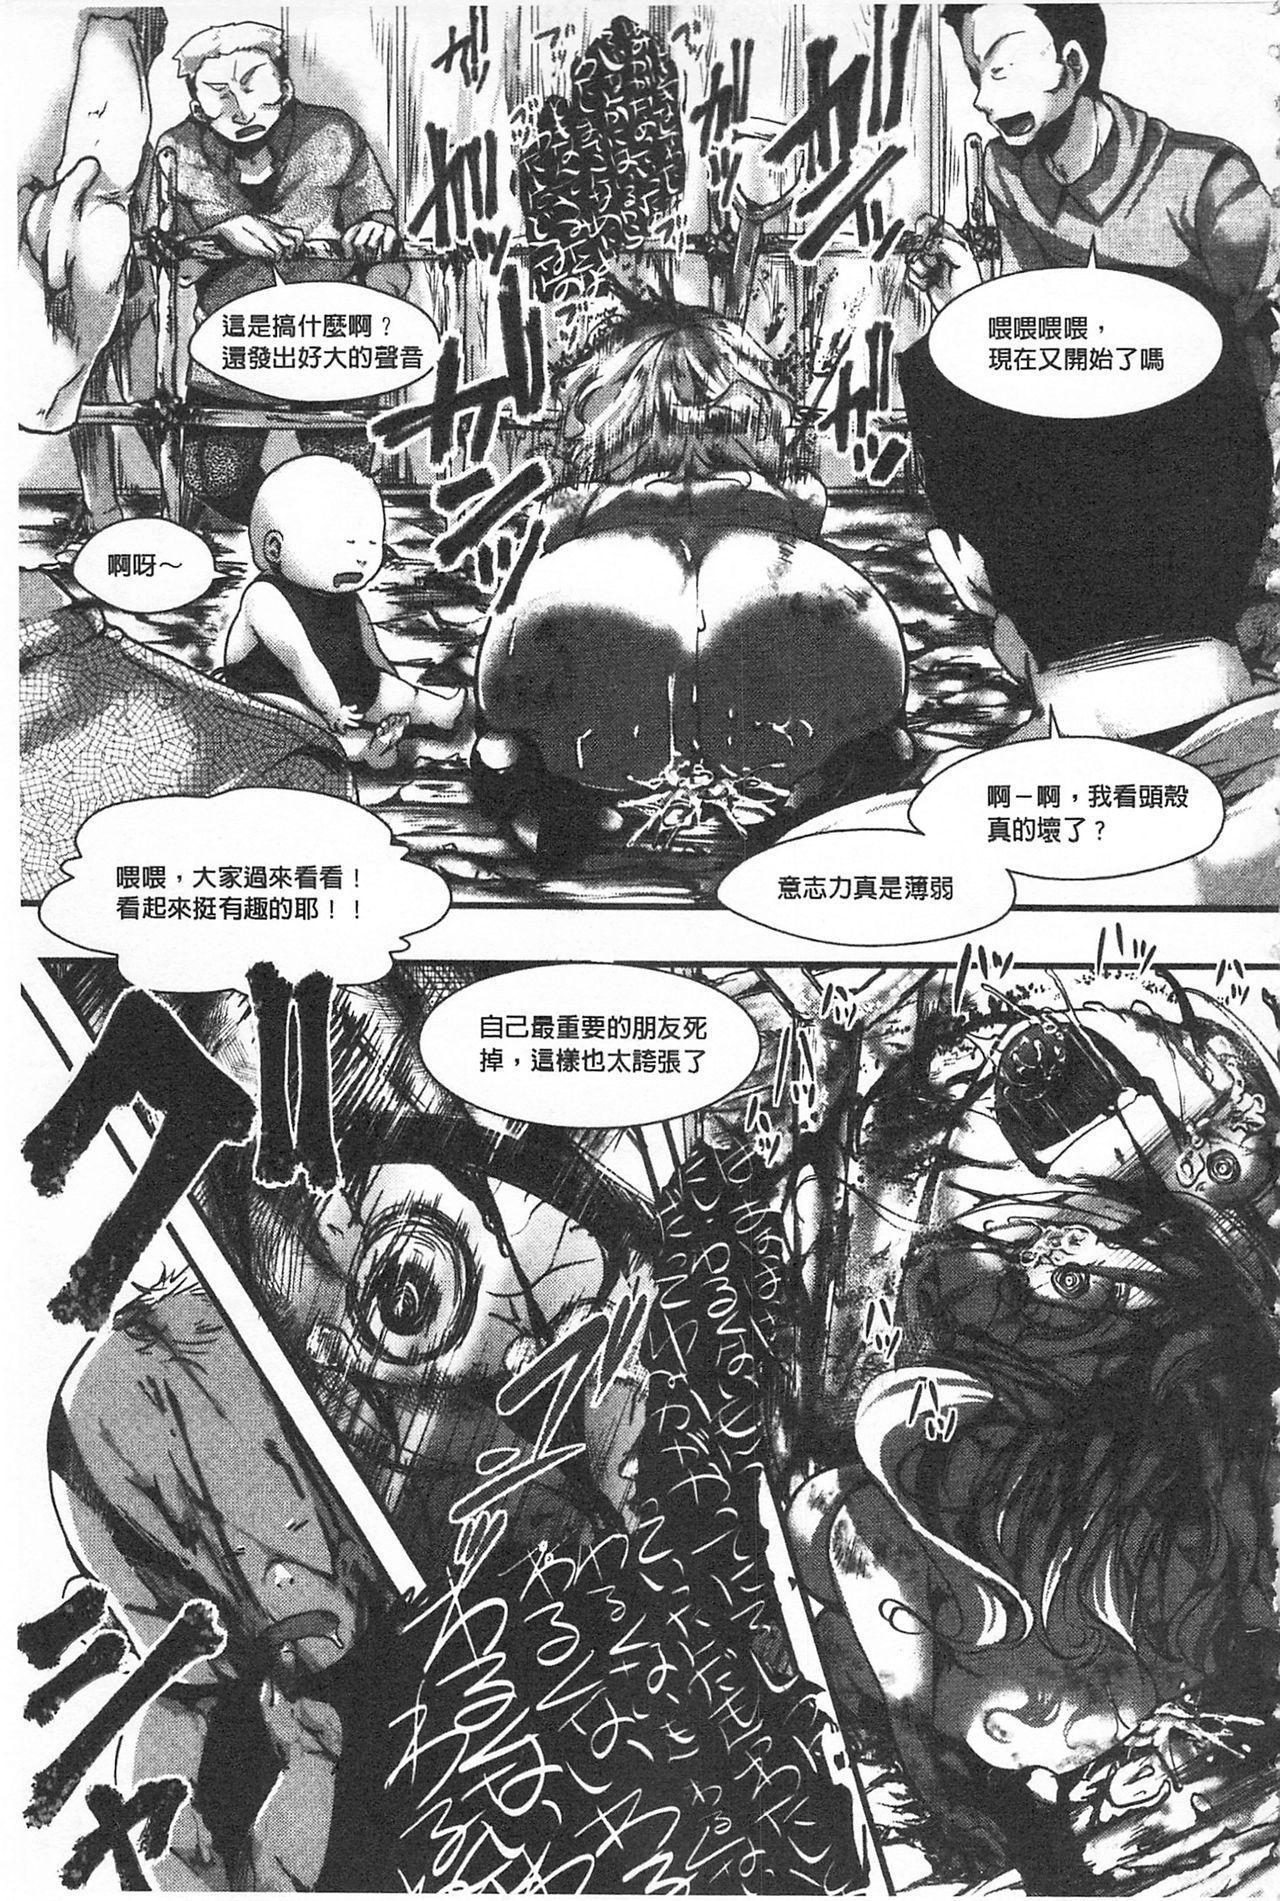 [hal] Daienjou -Ikare Ikasare Iki Ikare-   ∞艶嬢 -洩出來被搞到洩掛了被搞掛-  [Chinese] 116